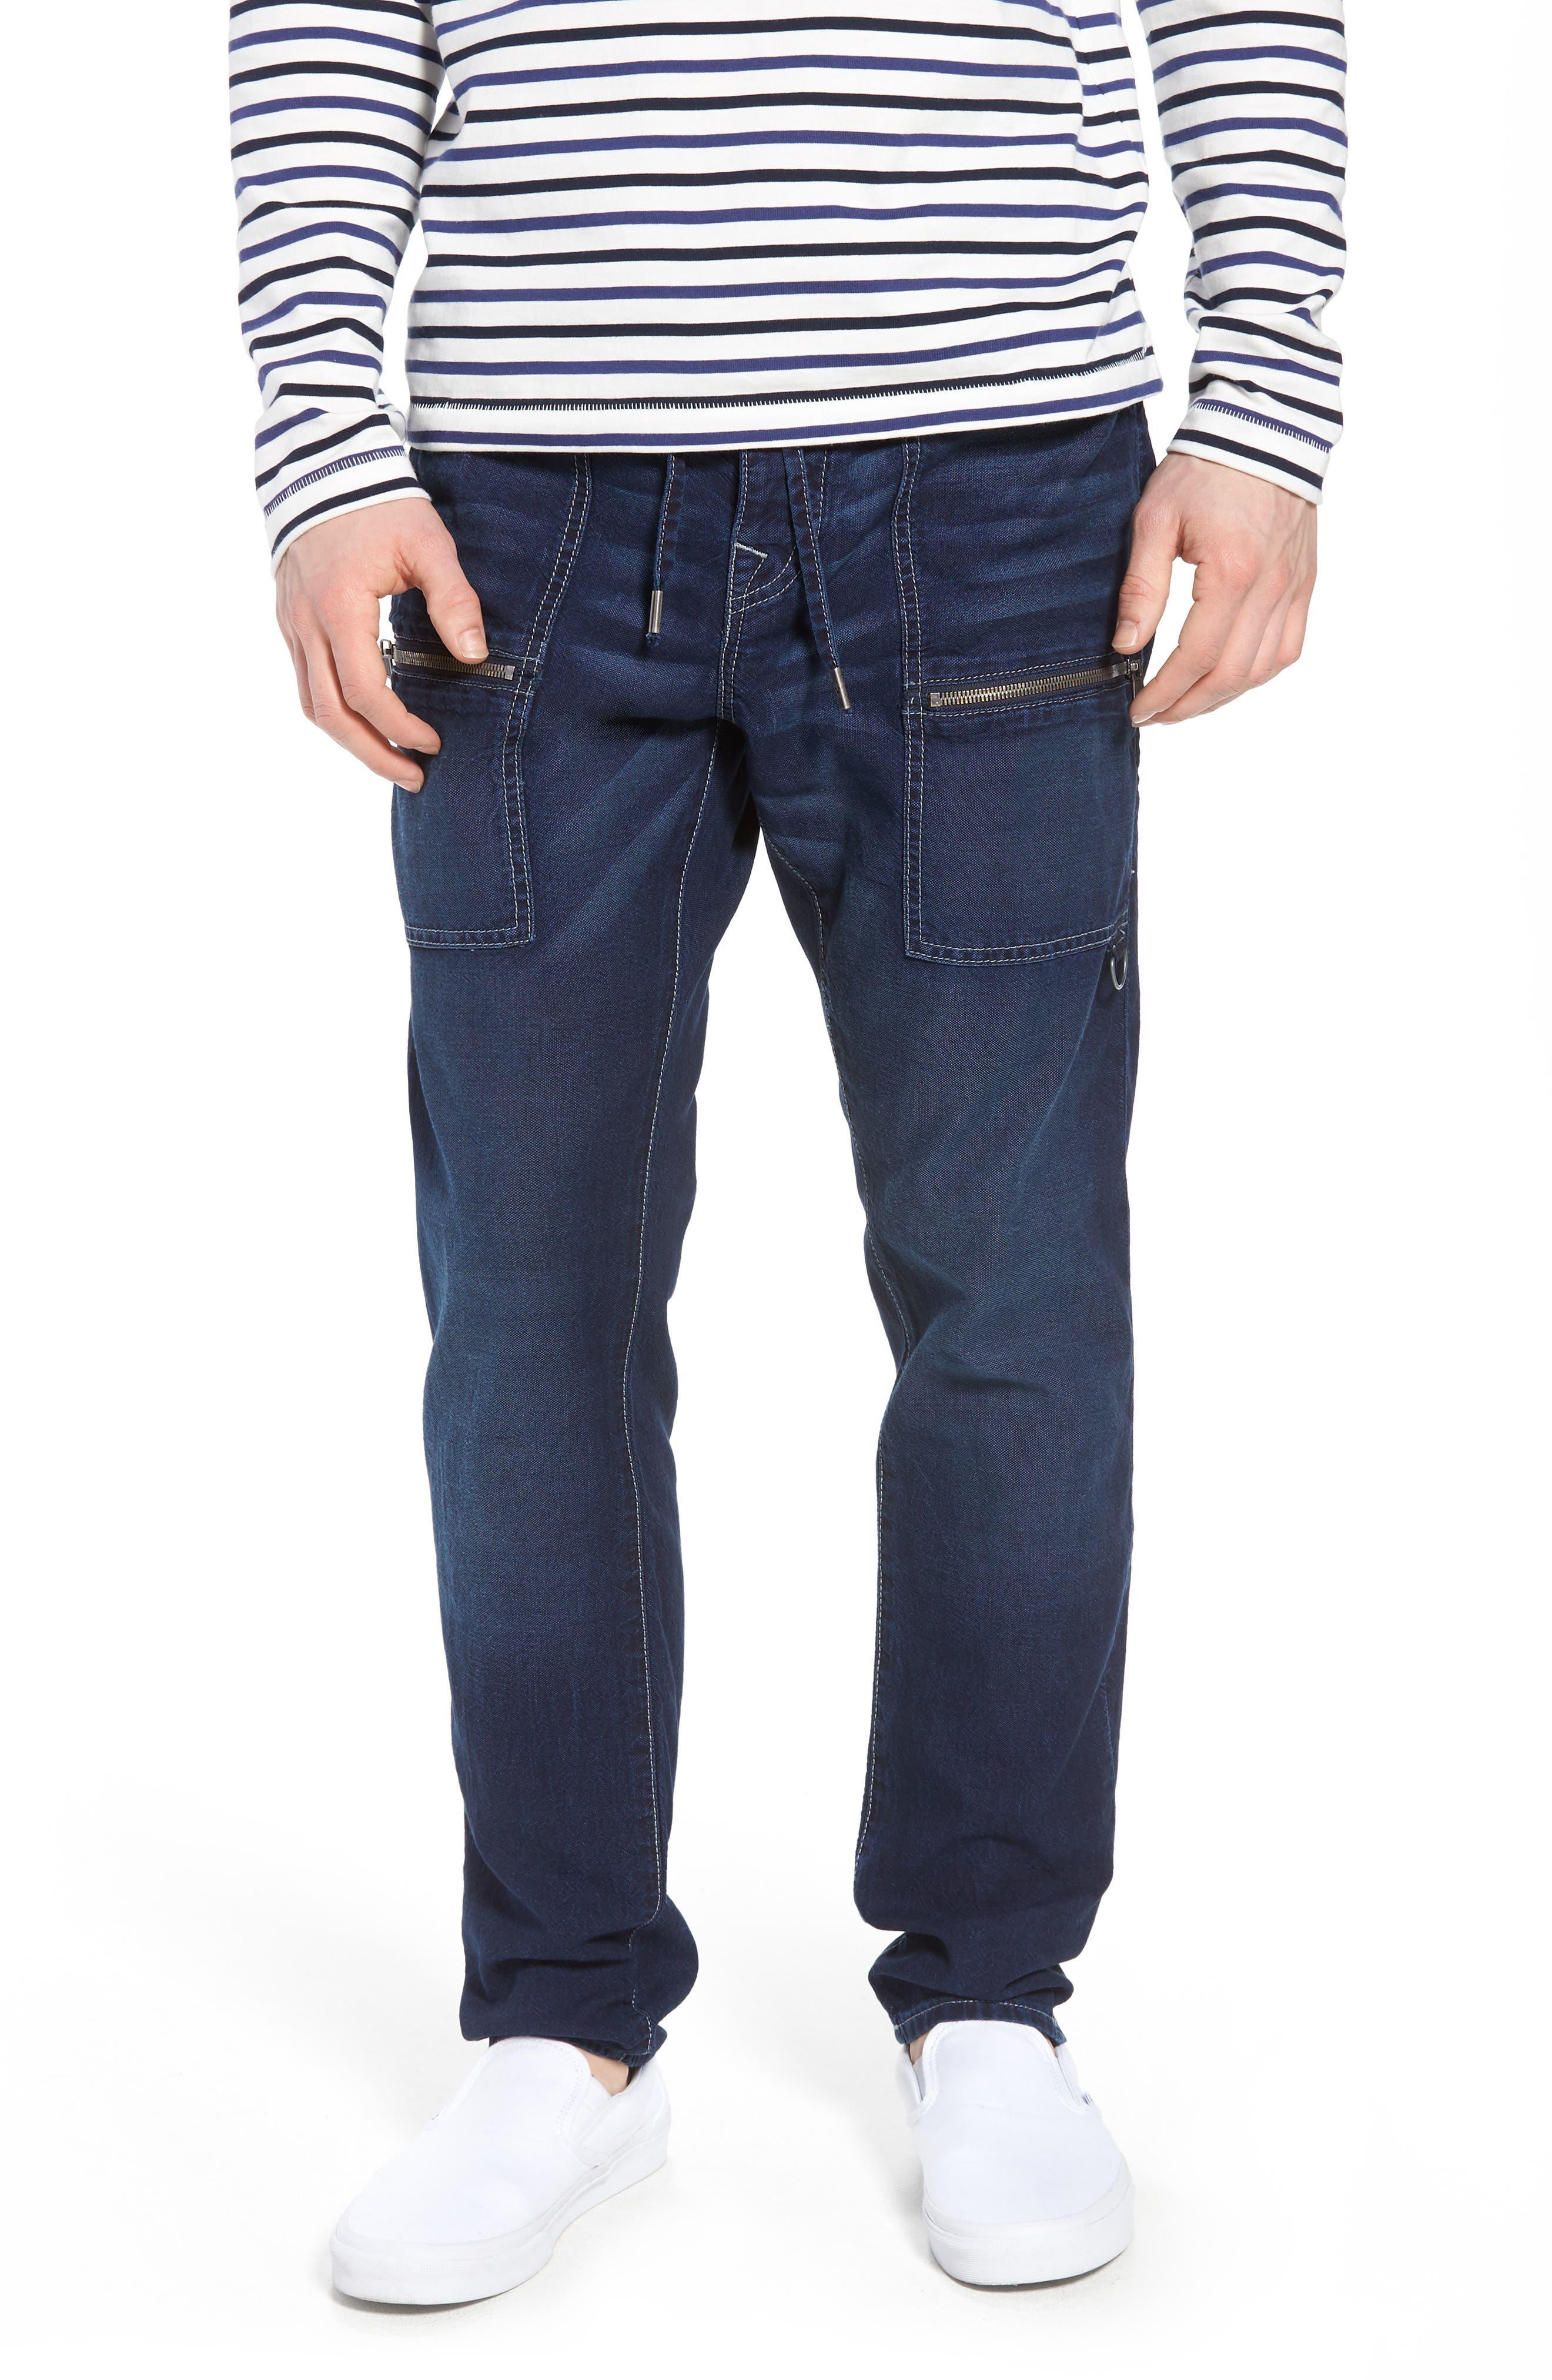 Trail Utility Jeans,                             Main thumbnail 1, color,                             UNION SPECIAL